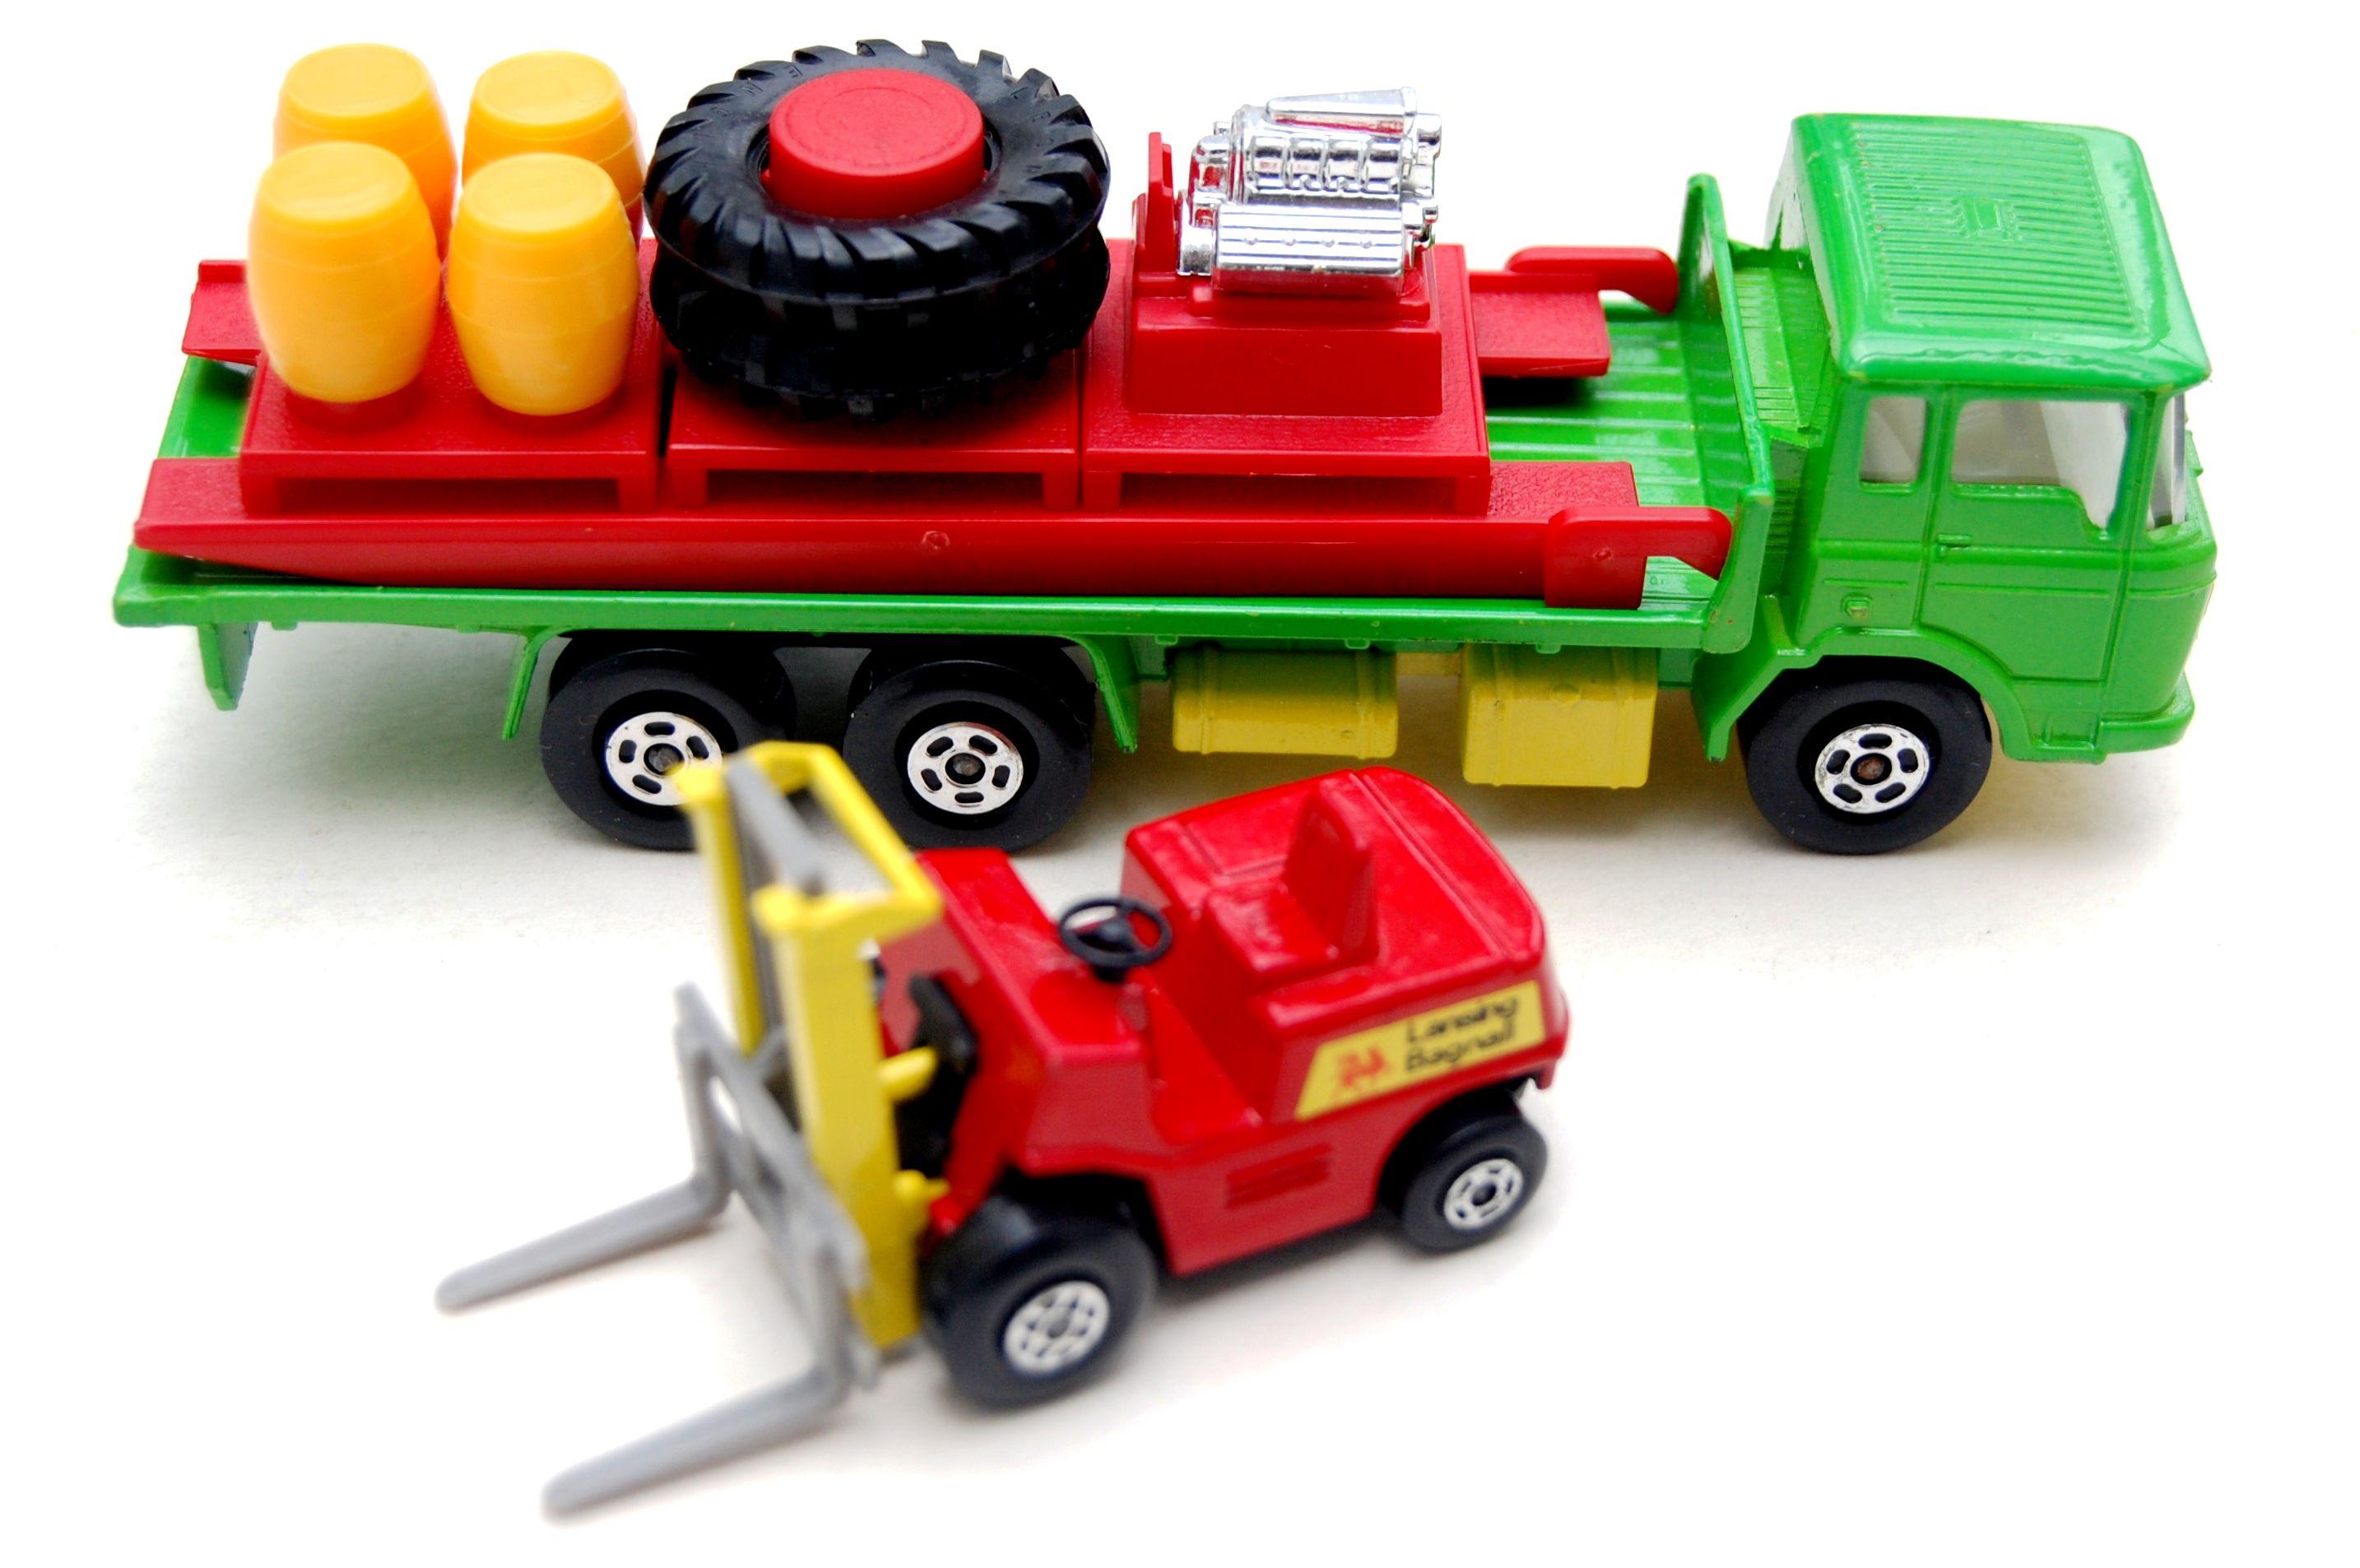 Vintage Toys Wanted By The Toy Exchange Matchbox K 20 Super Kings Cargo Hauler Fork Lift Pallet Loader Toy Model Cars Vintage Toys Toy Trucks